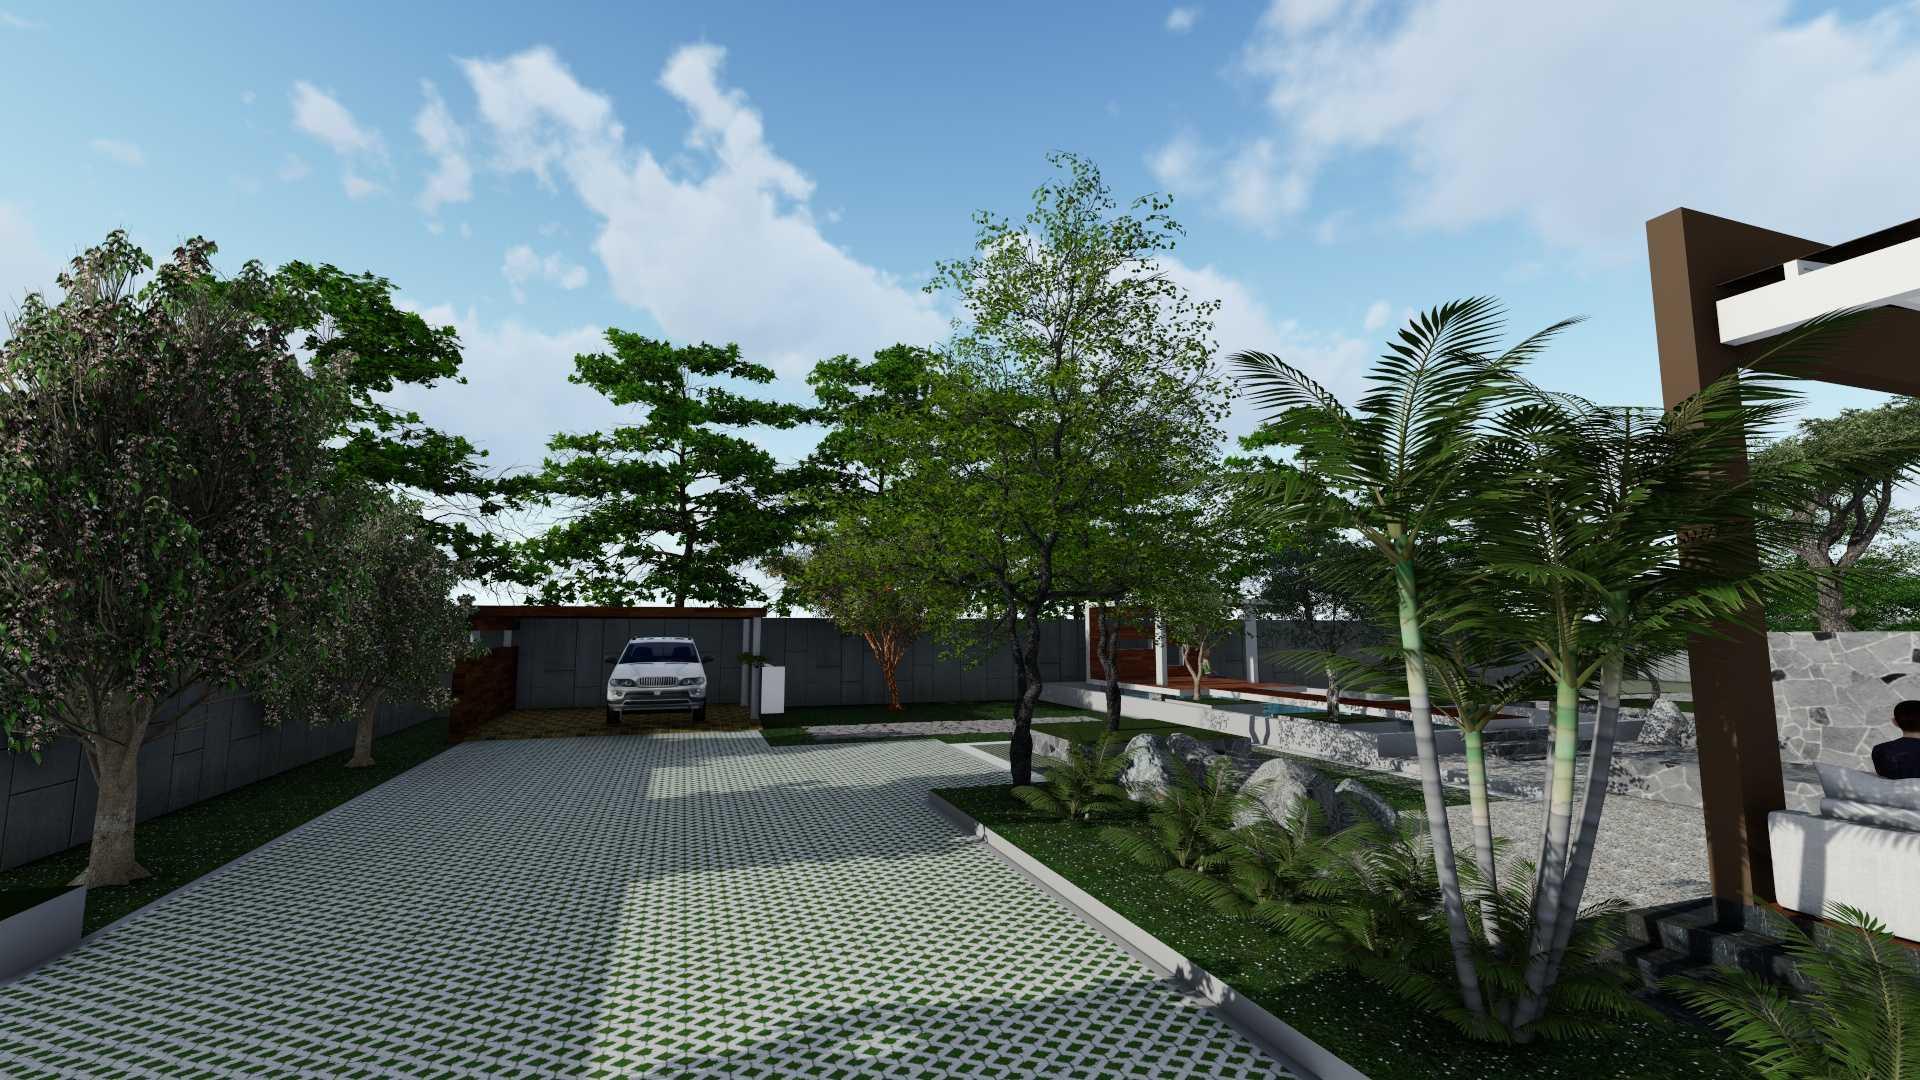 Eko Hidayat Arwana Park House Air Hitam, Kec. Payung Sekaki, Kota Pekanbaru, Riau, Indonesia Air Hitam, Kec. Payung Sekaki, Kota Pekanbaru, Riau, Indonesia Eko-Hidayat-Arwana-Park-House  108786